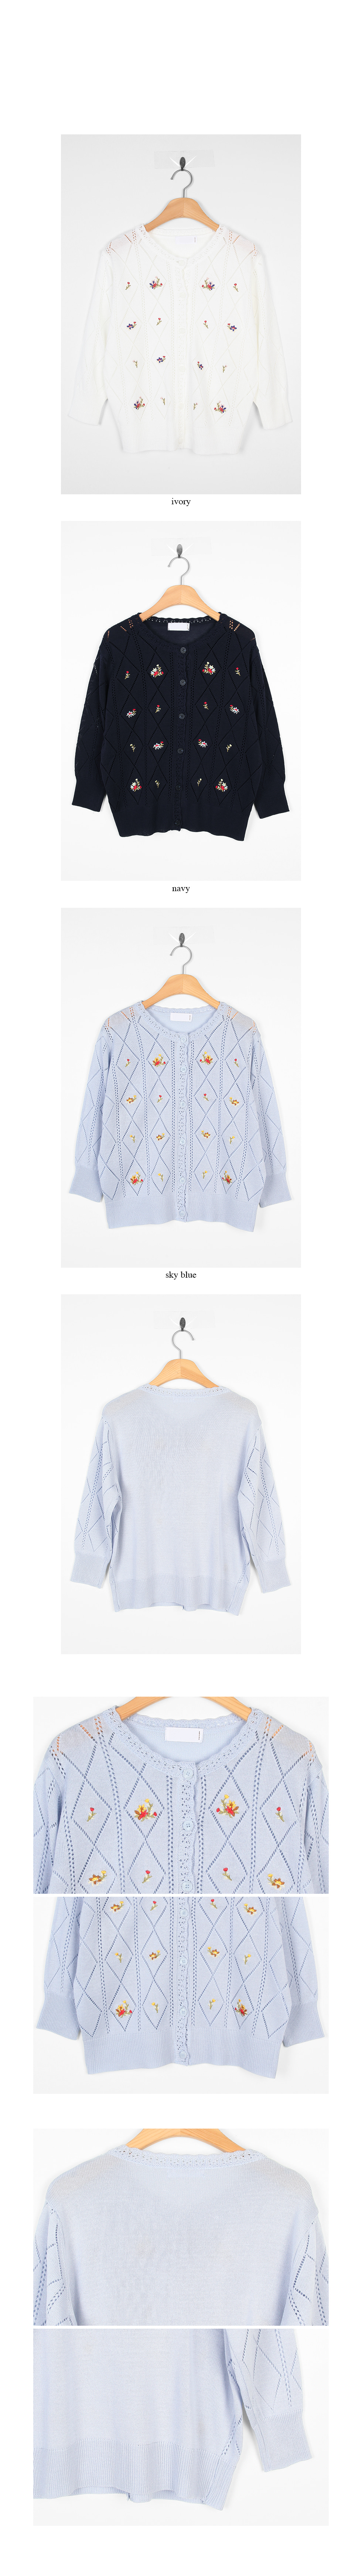 flower diamond knit cardigan